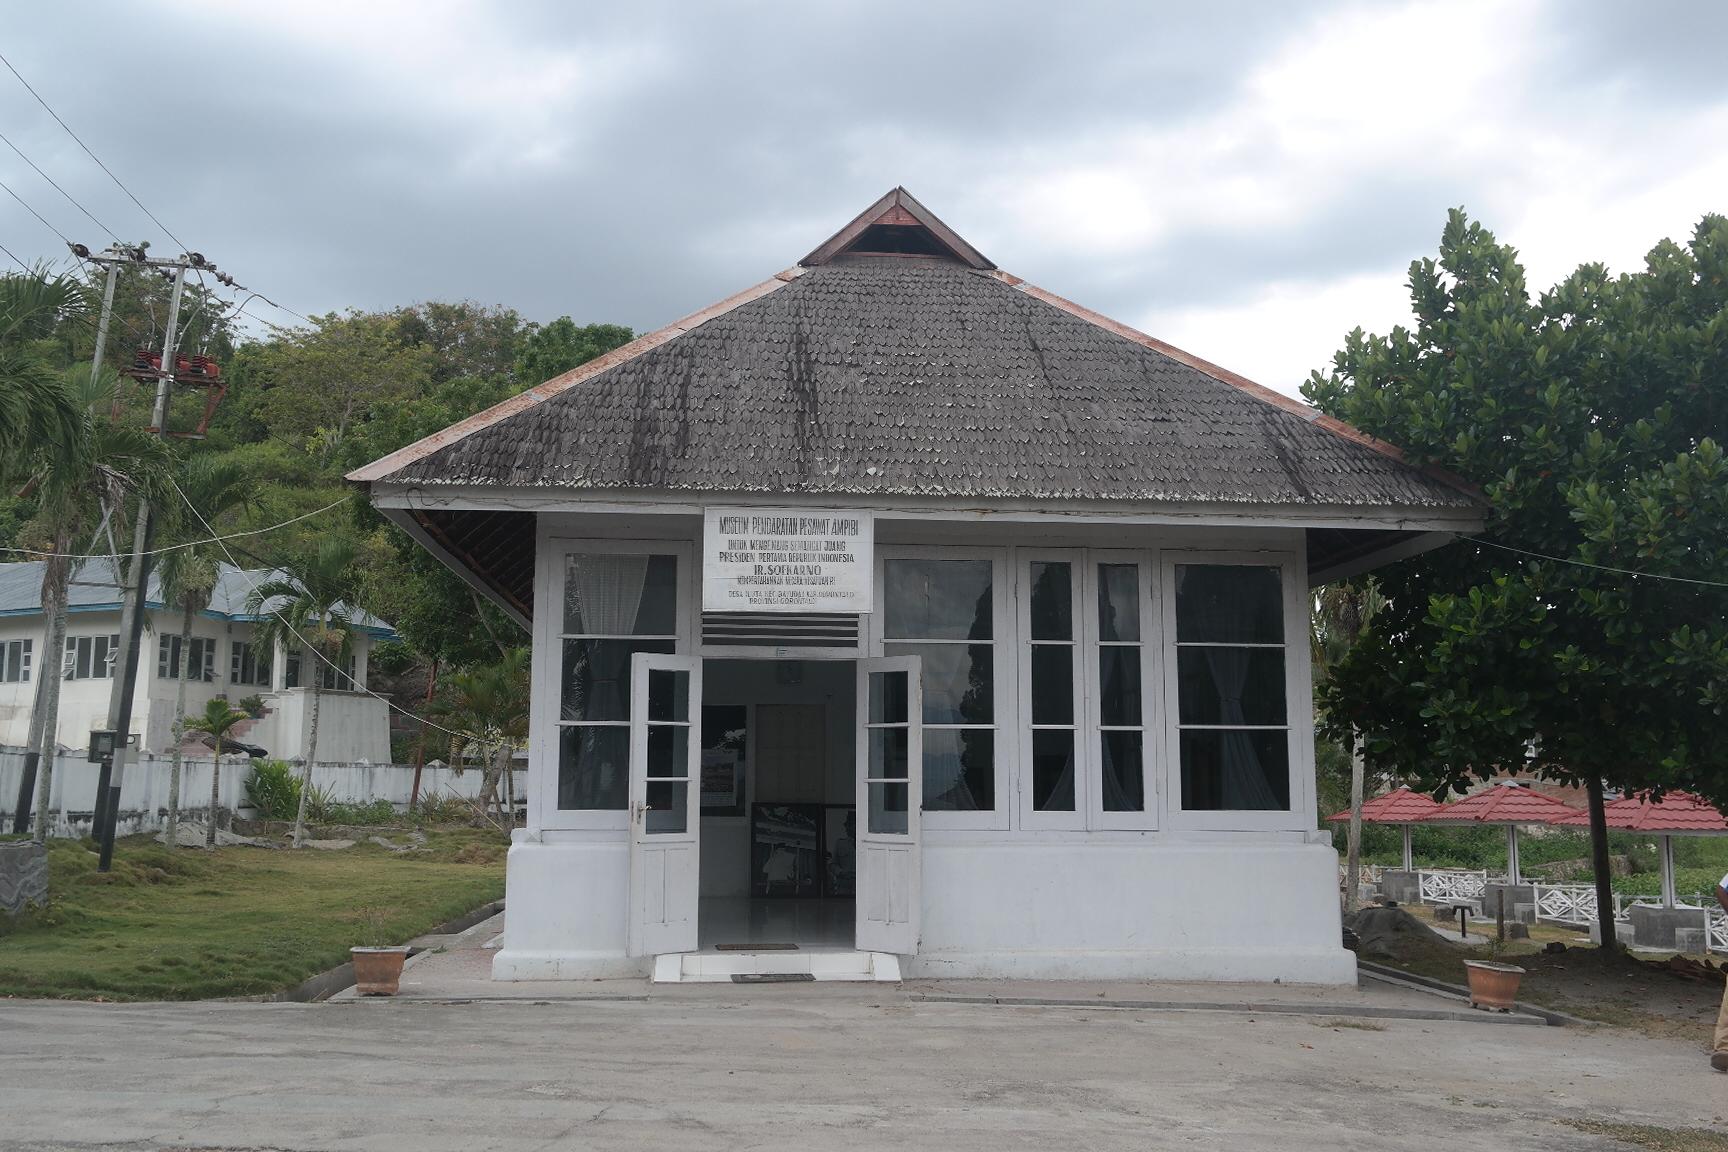 4 Wisata sejarah ini dapat kamu kunjungi ketika berada di Gorontalo